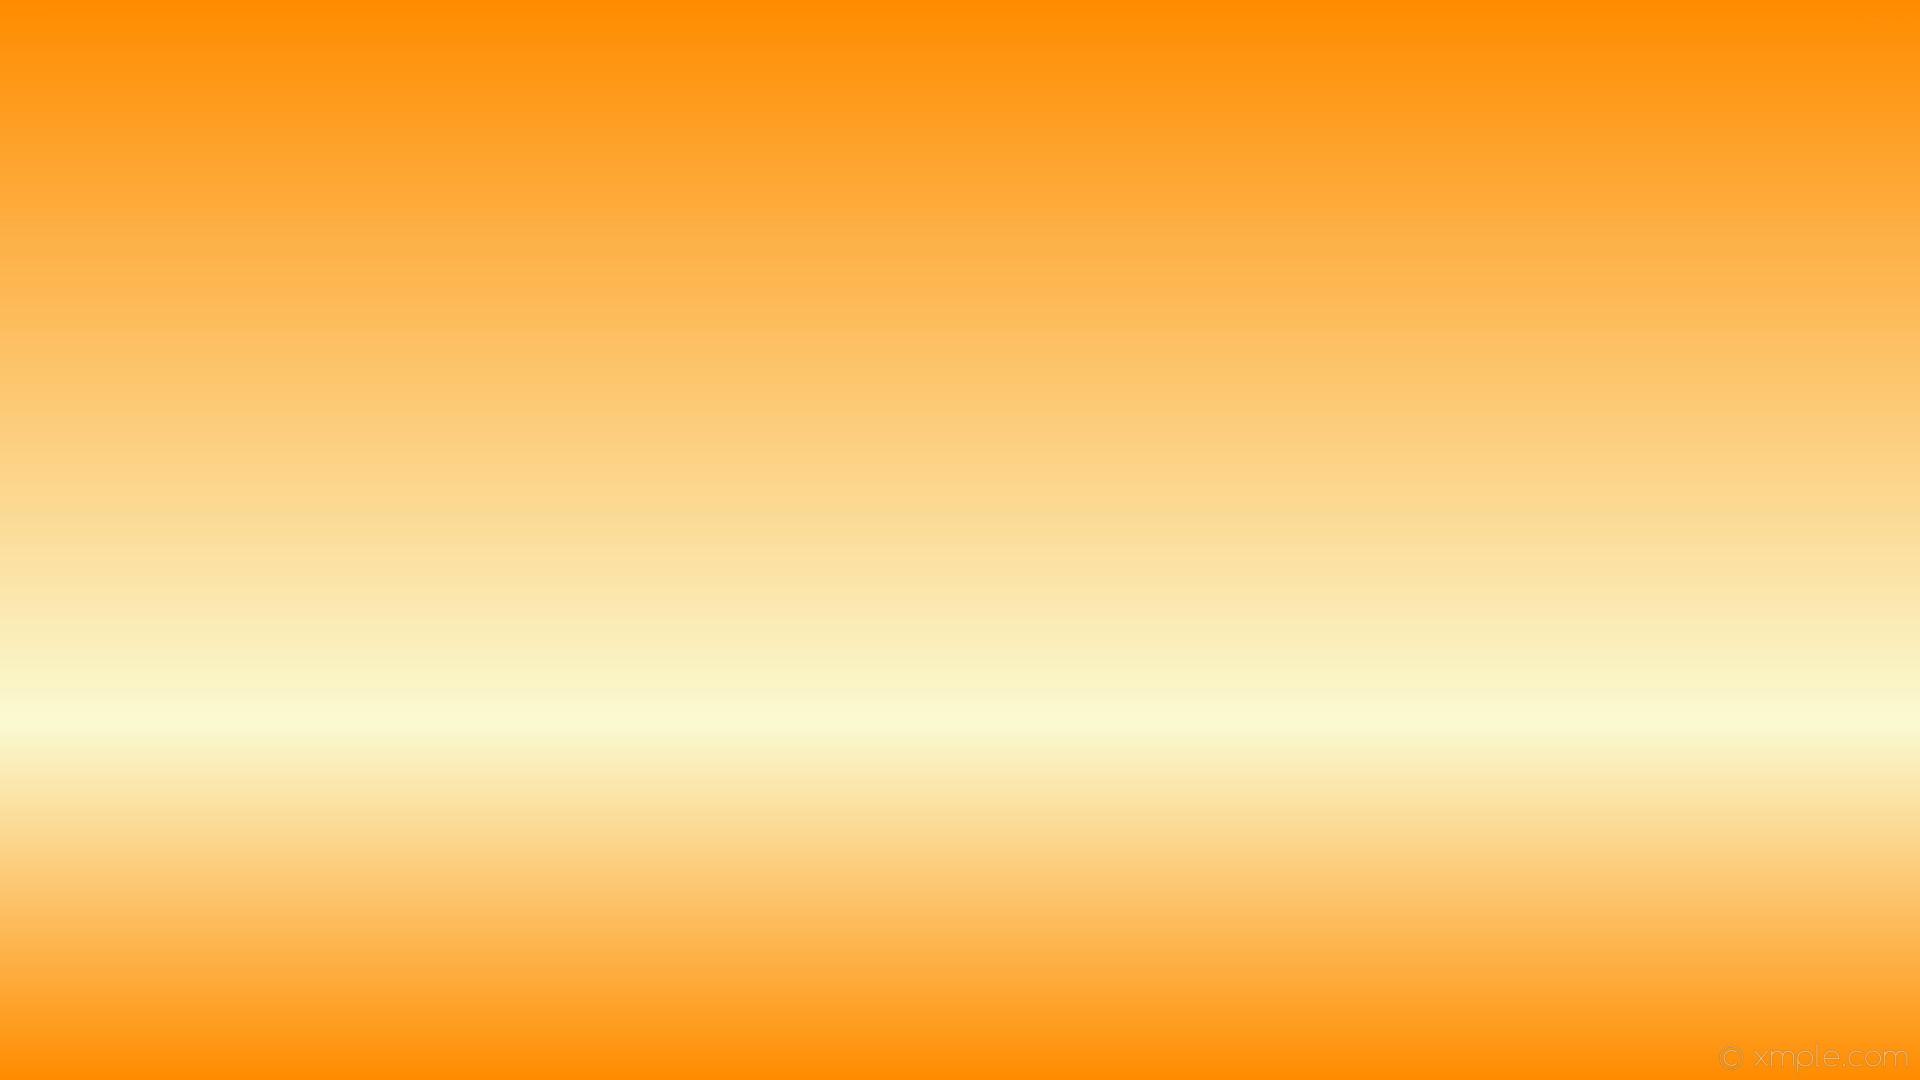 wallpaper gradient highlight yellow orange linear dark orange light  goldenrod yellow #ff8c00 #fafad2 90